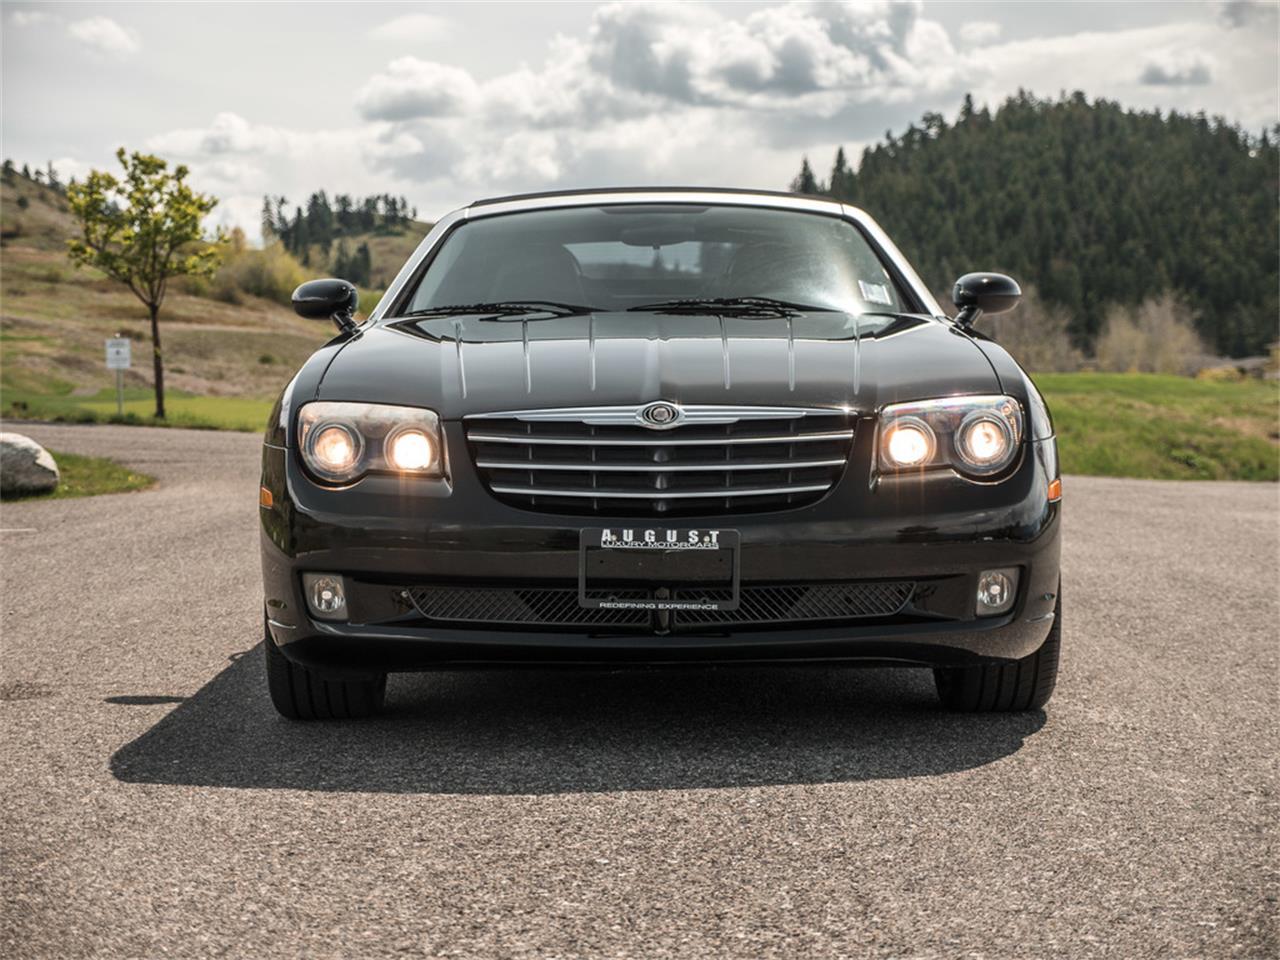 2005 Chrysler Crossfire (CC-1242015) for sale in Kelowna, British Columbia